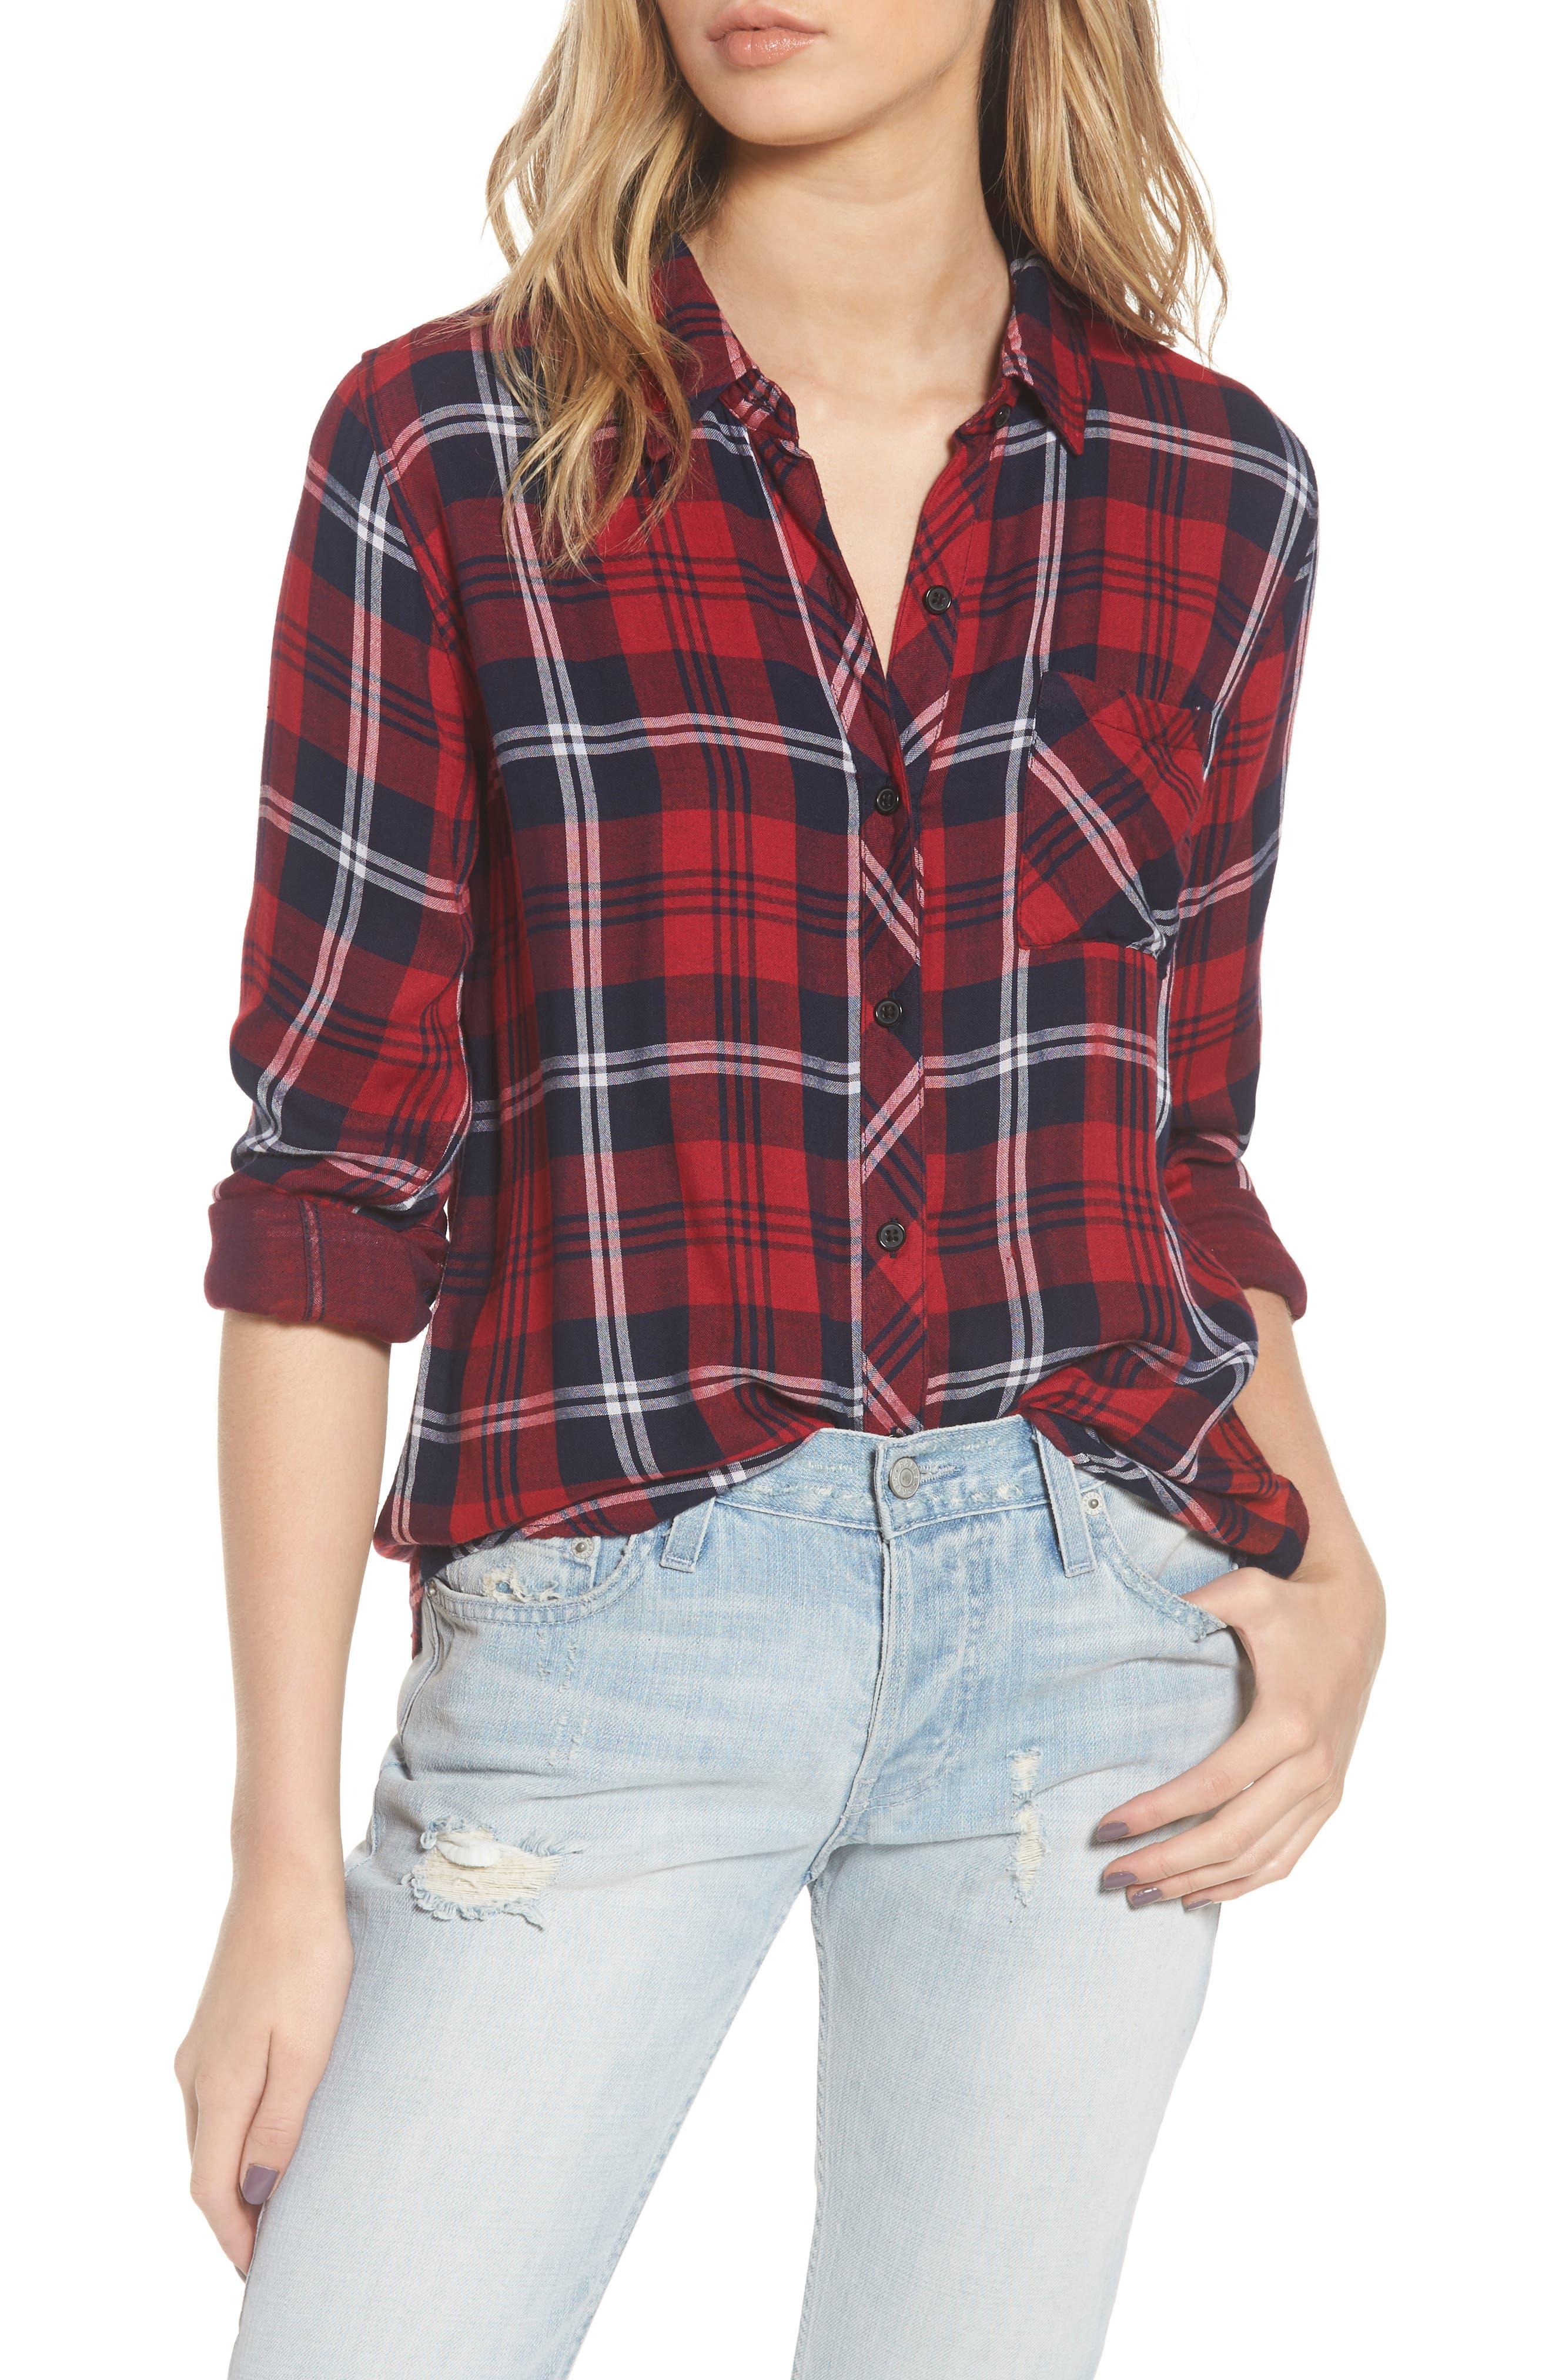 Taitum Plaid Shirt,                         Main,                         color, 622